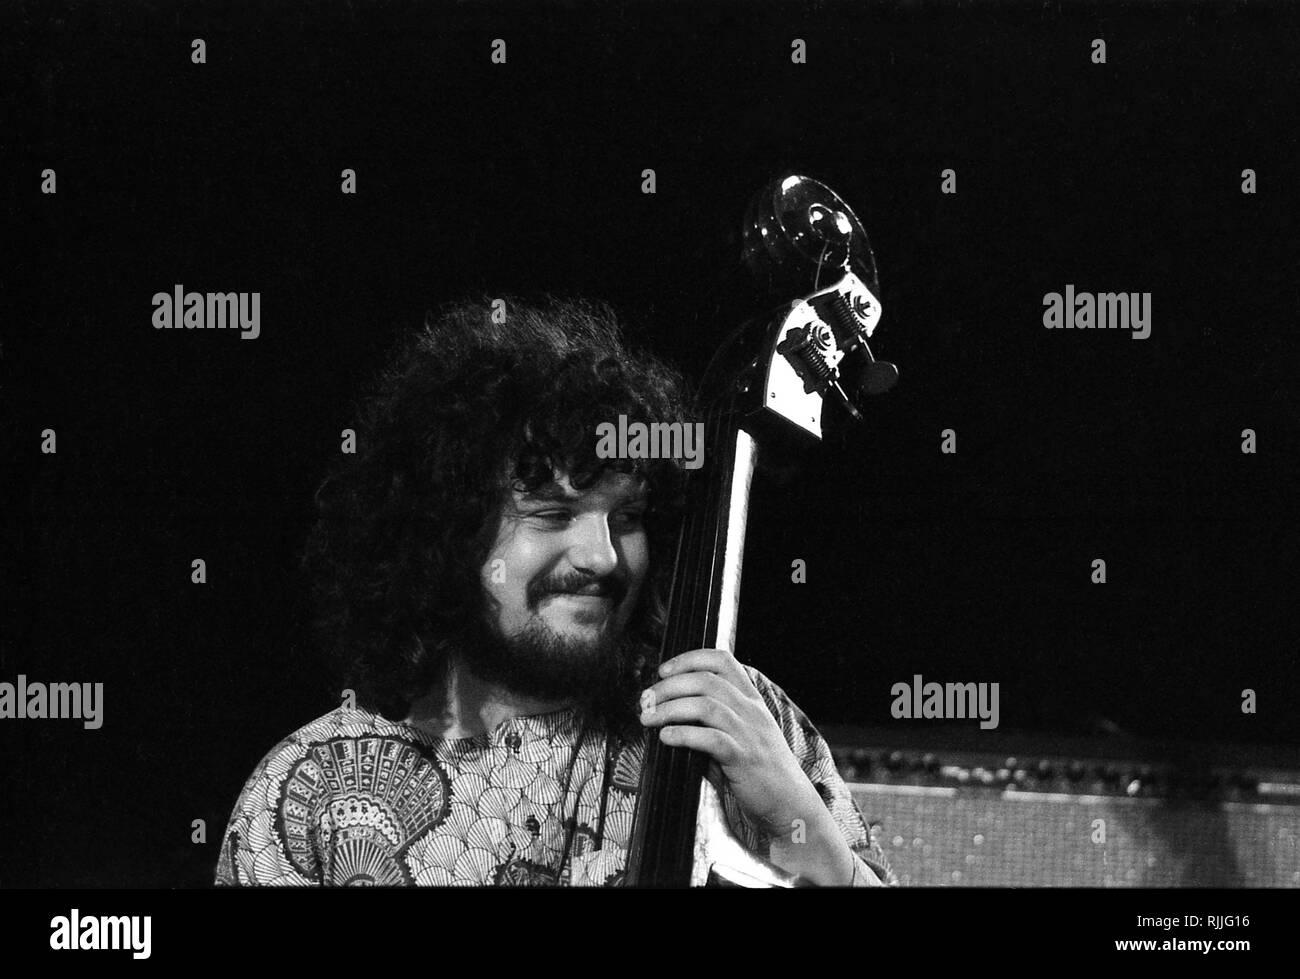 Léon Francioli in Concert in Chateauvallon, 1972 - Stock Image